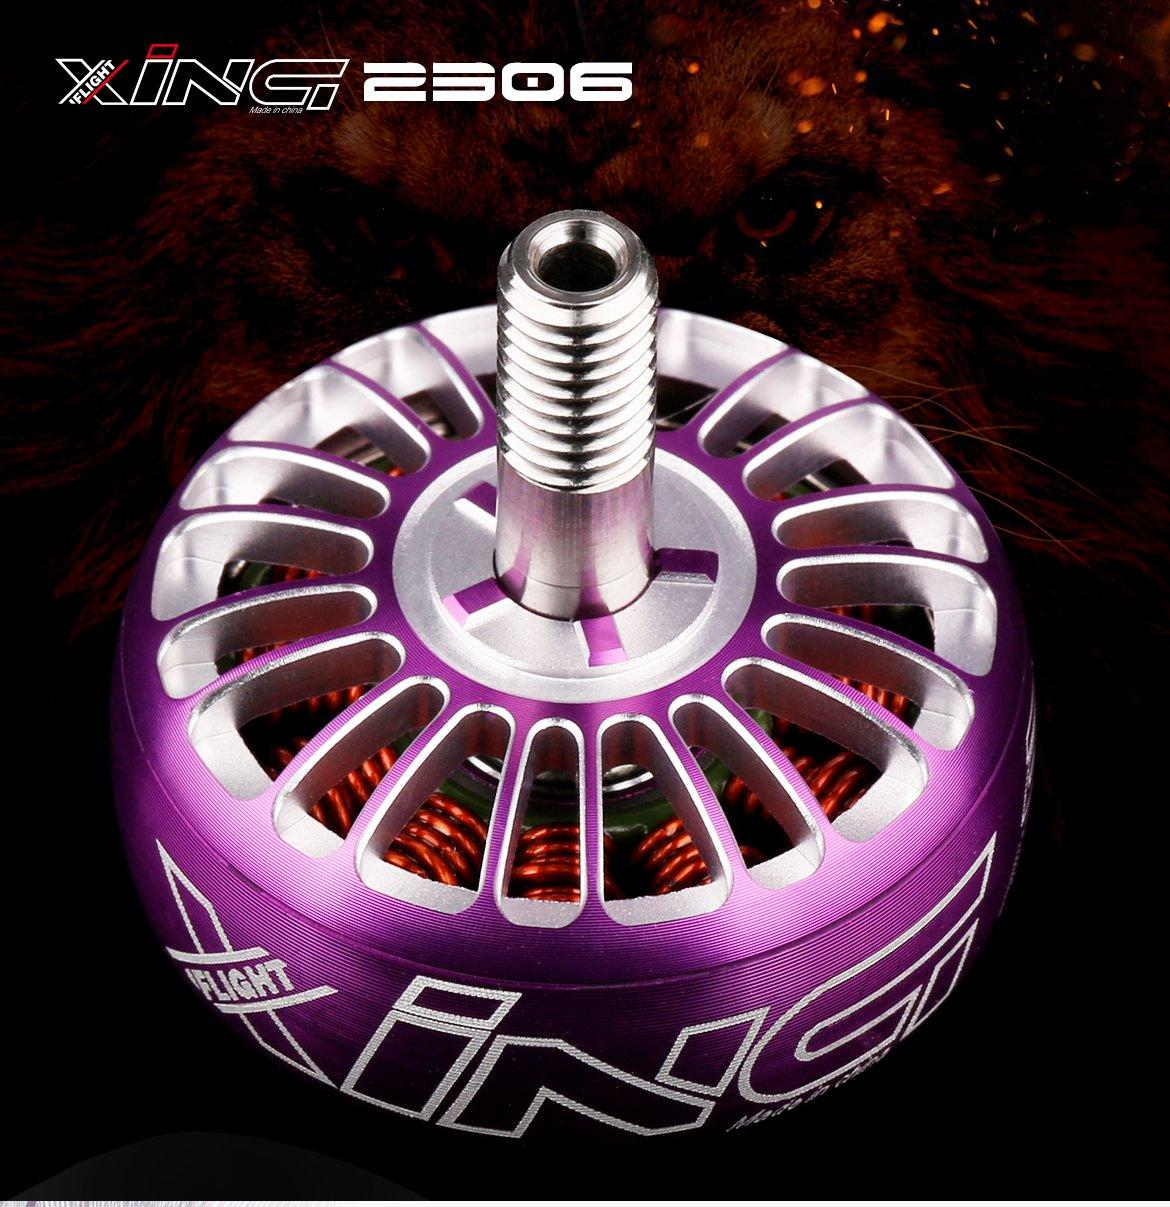 xing-x2306-2-6s-fpv-1700-2450-2750kv-motor-pic.jpg